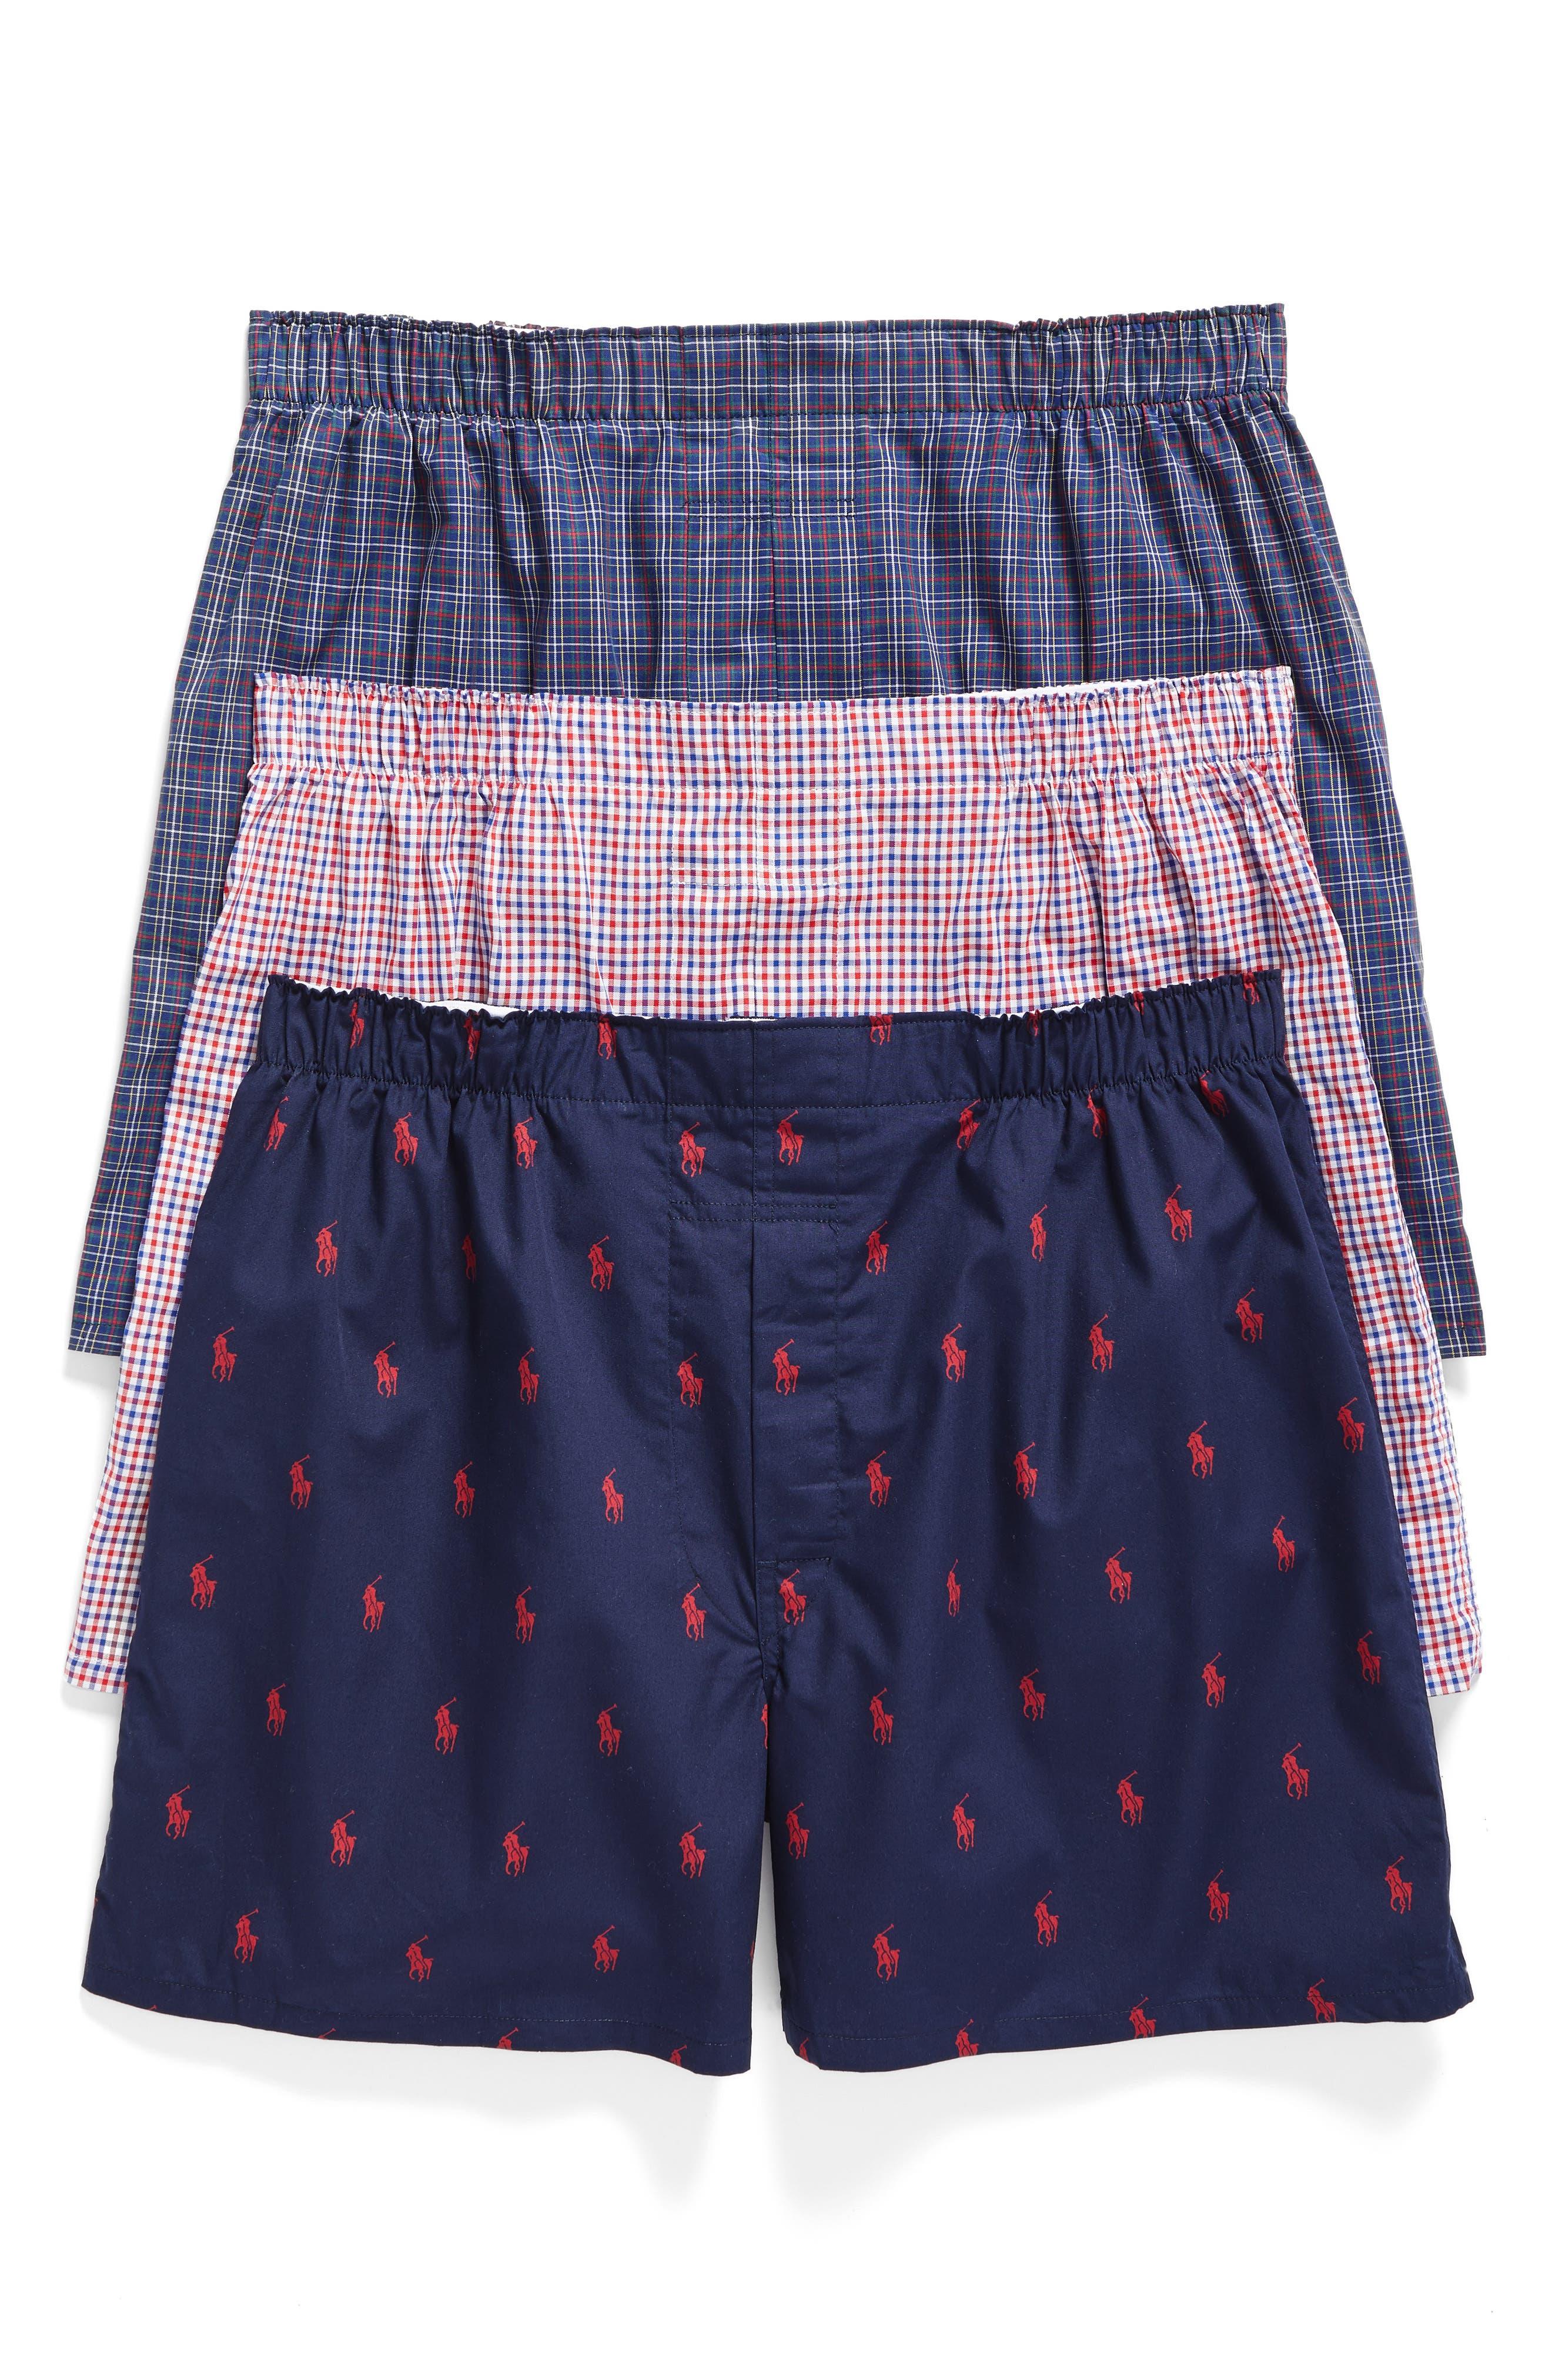 3-Pack Woven Cotton Boxers,                         Main,                         color, Navy/ Red Plaid/ Blue Plaid